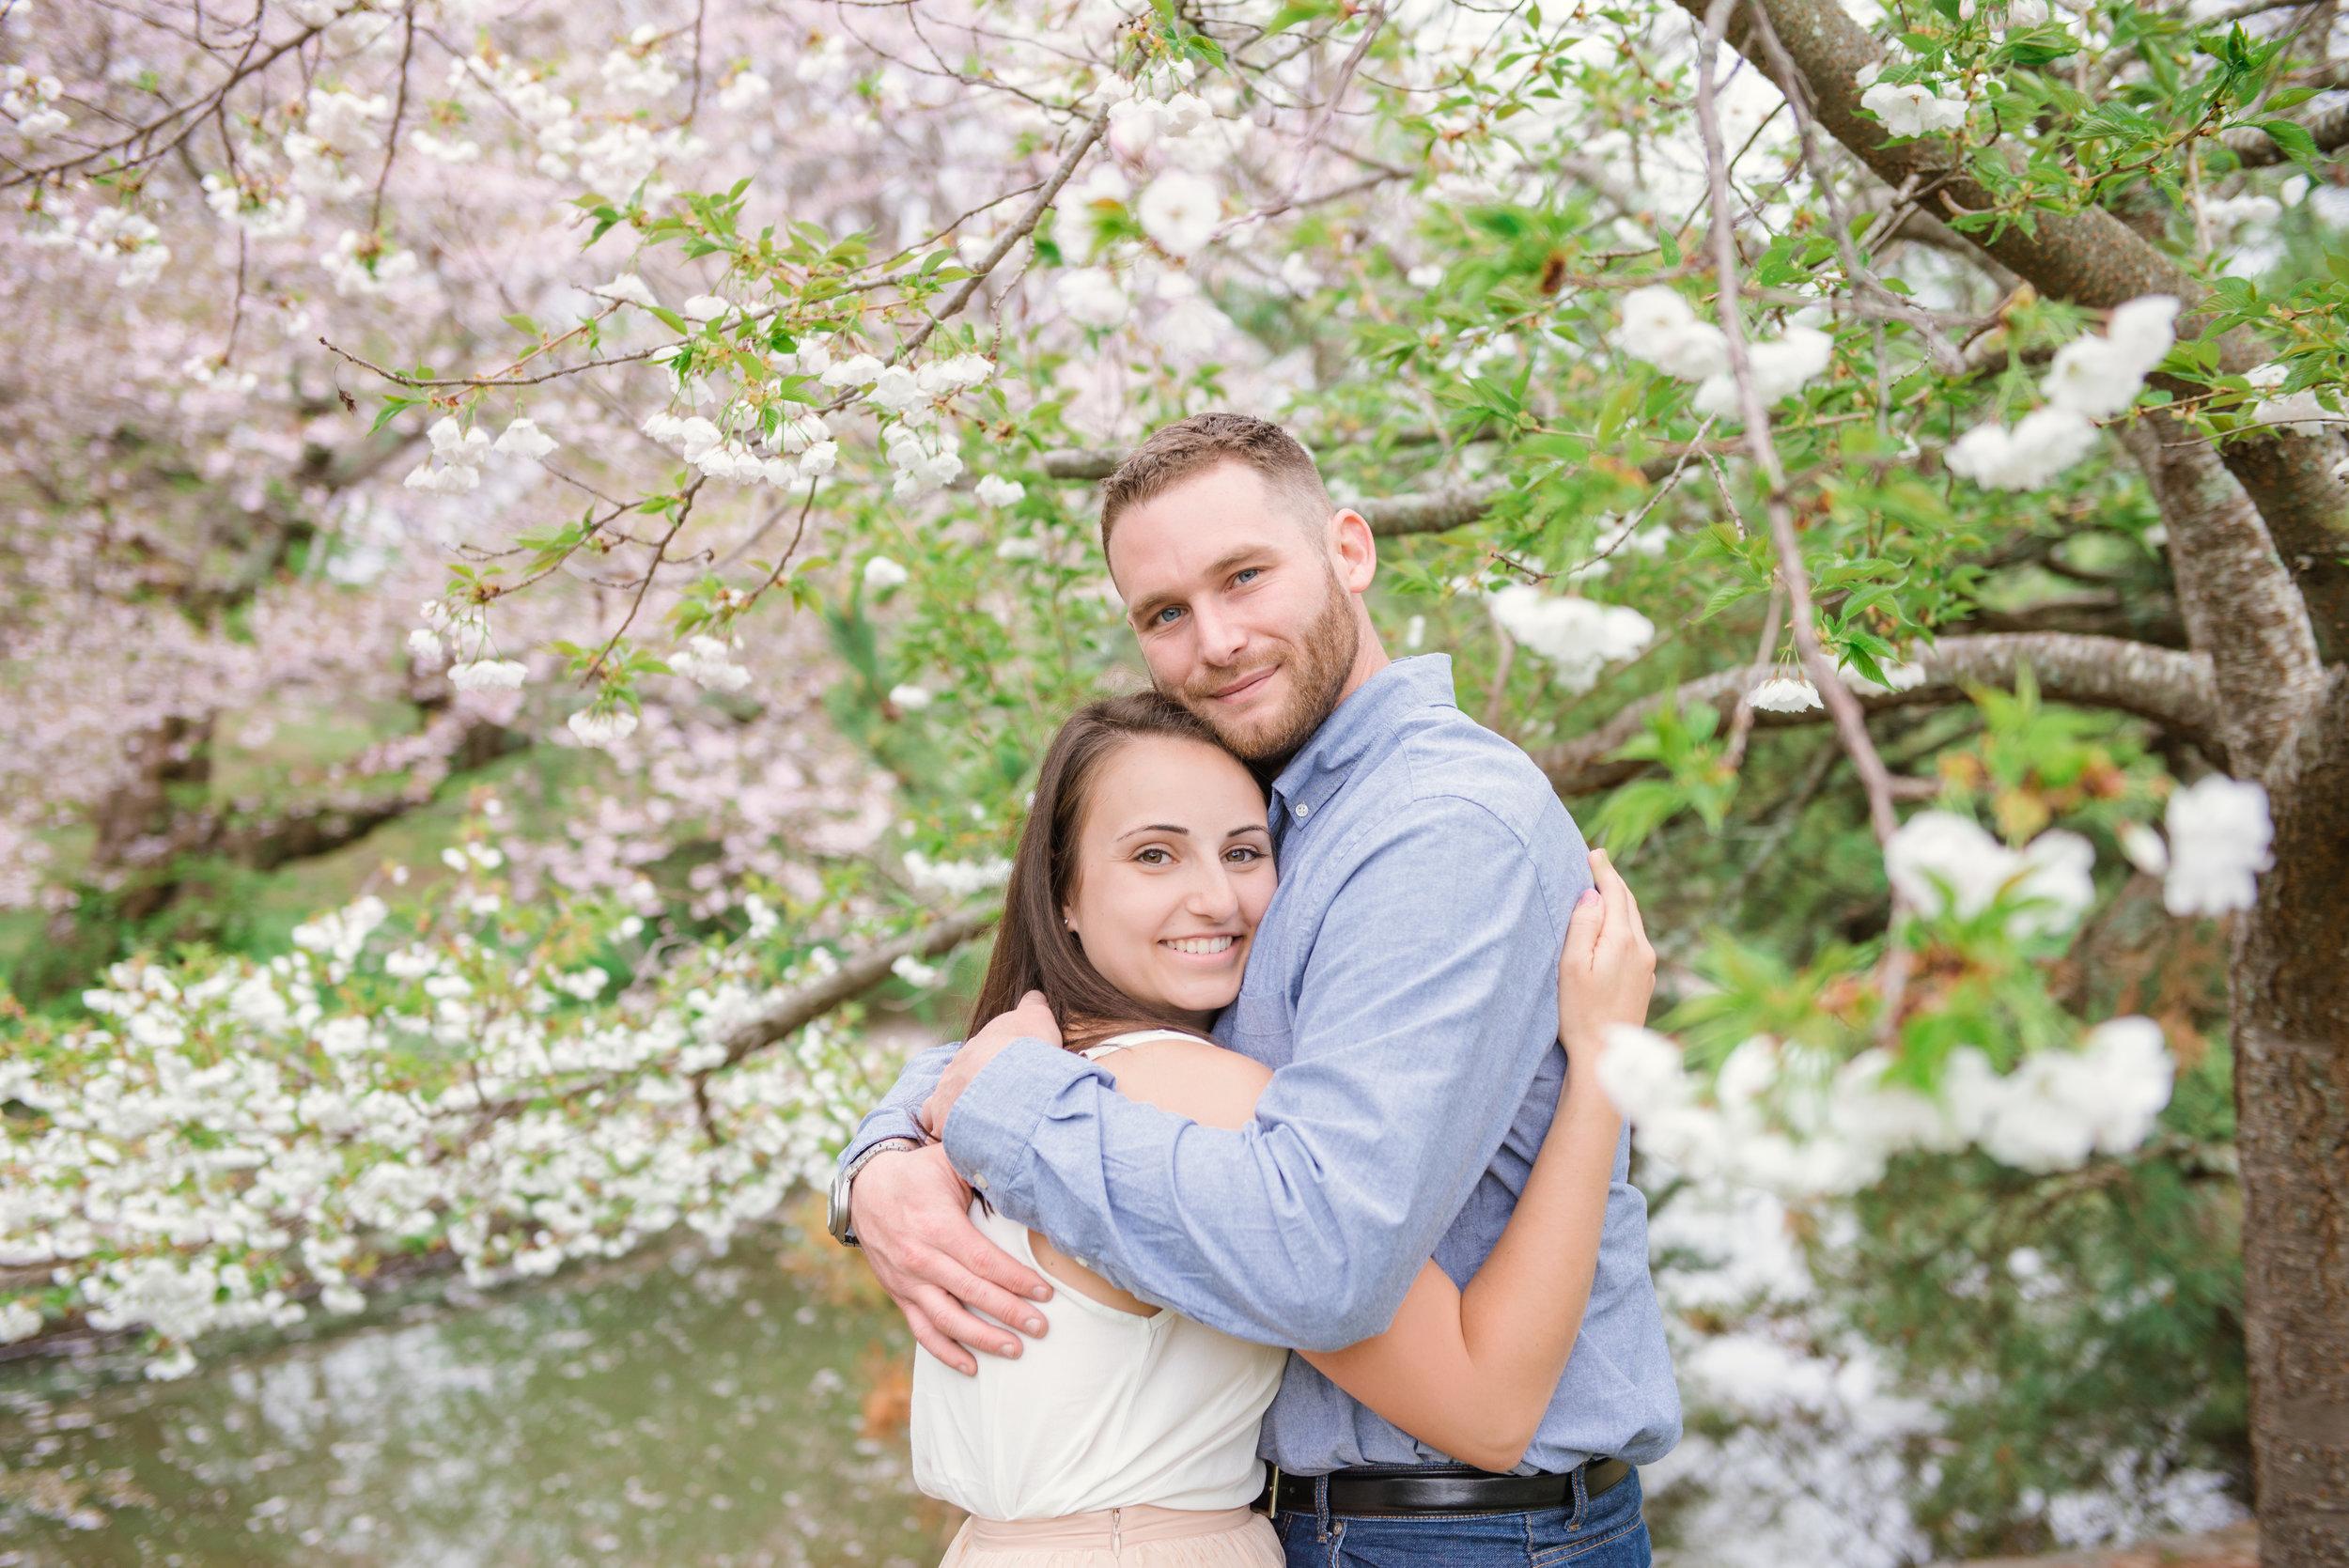 Romantic Engagment Roger Williams Park Cherry Blossom Trees Rhode Island Wedding Photographer.jpg